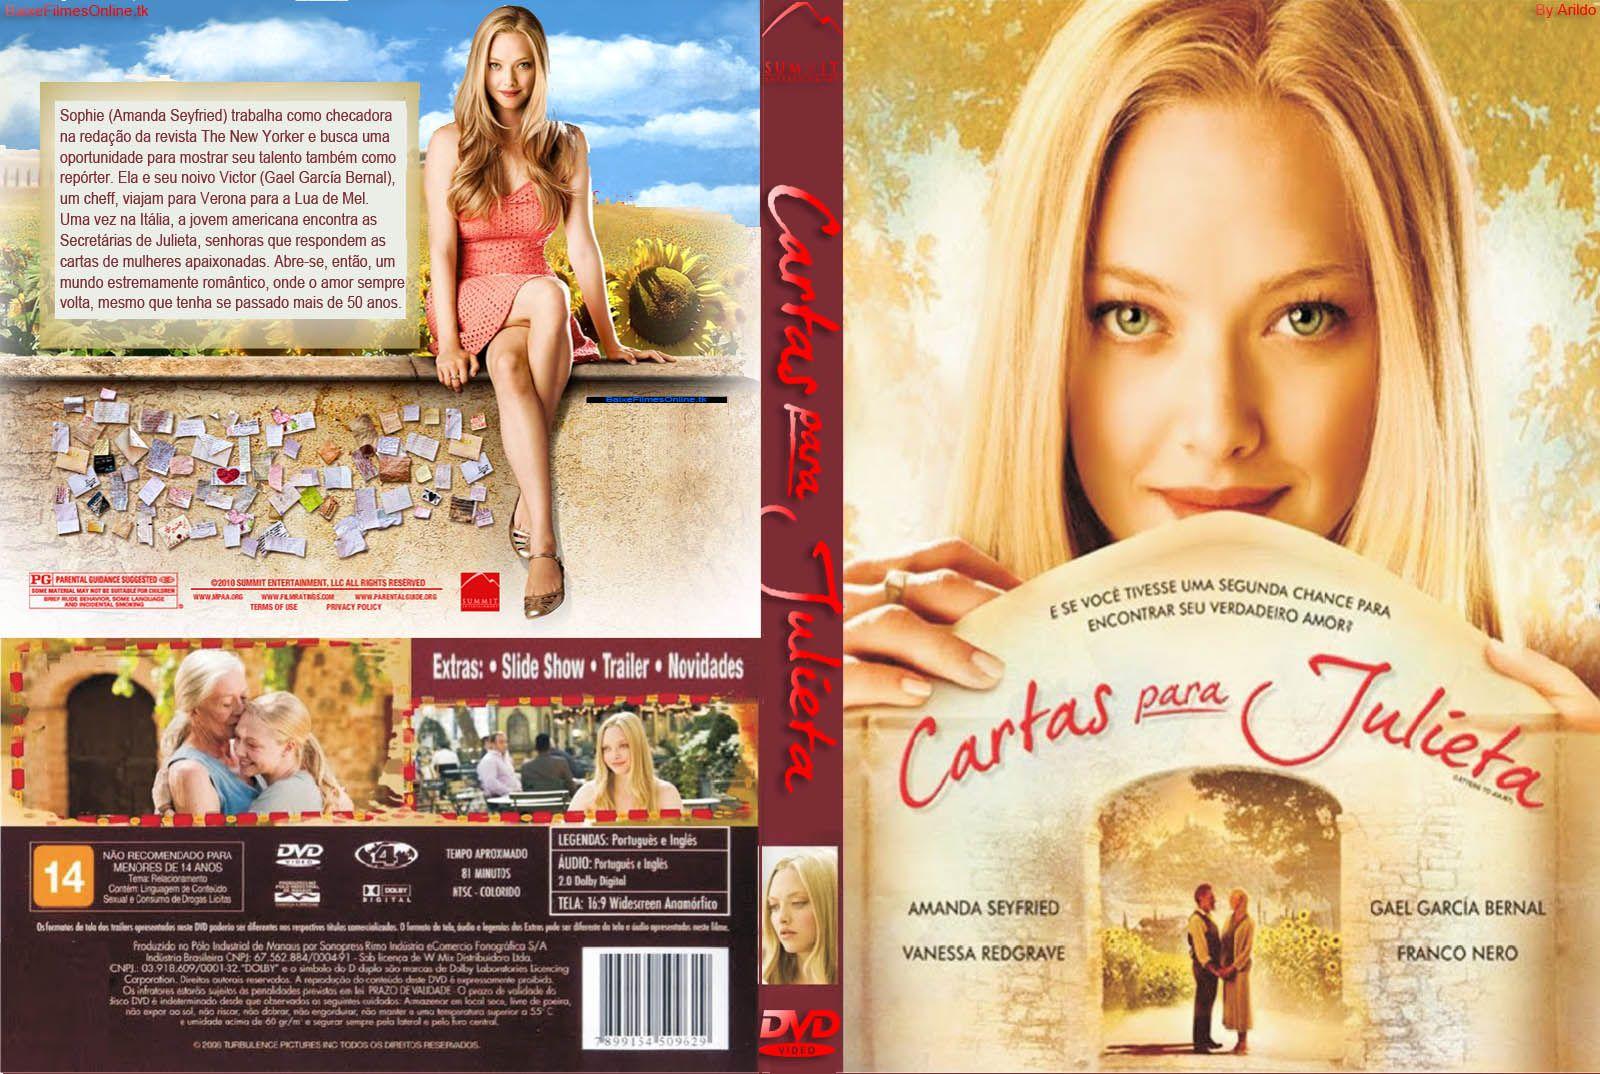 Carta Para Julieta Cartas Para Julieta Capas De Filmes Filmes De Romance